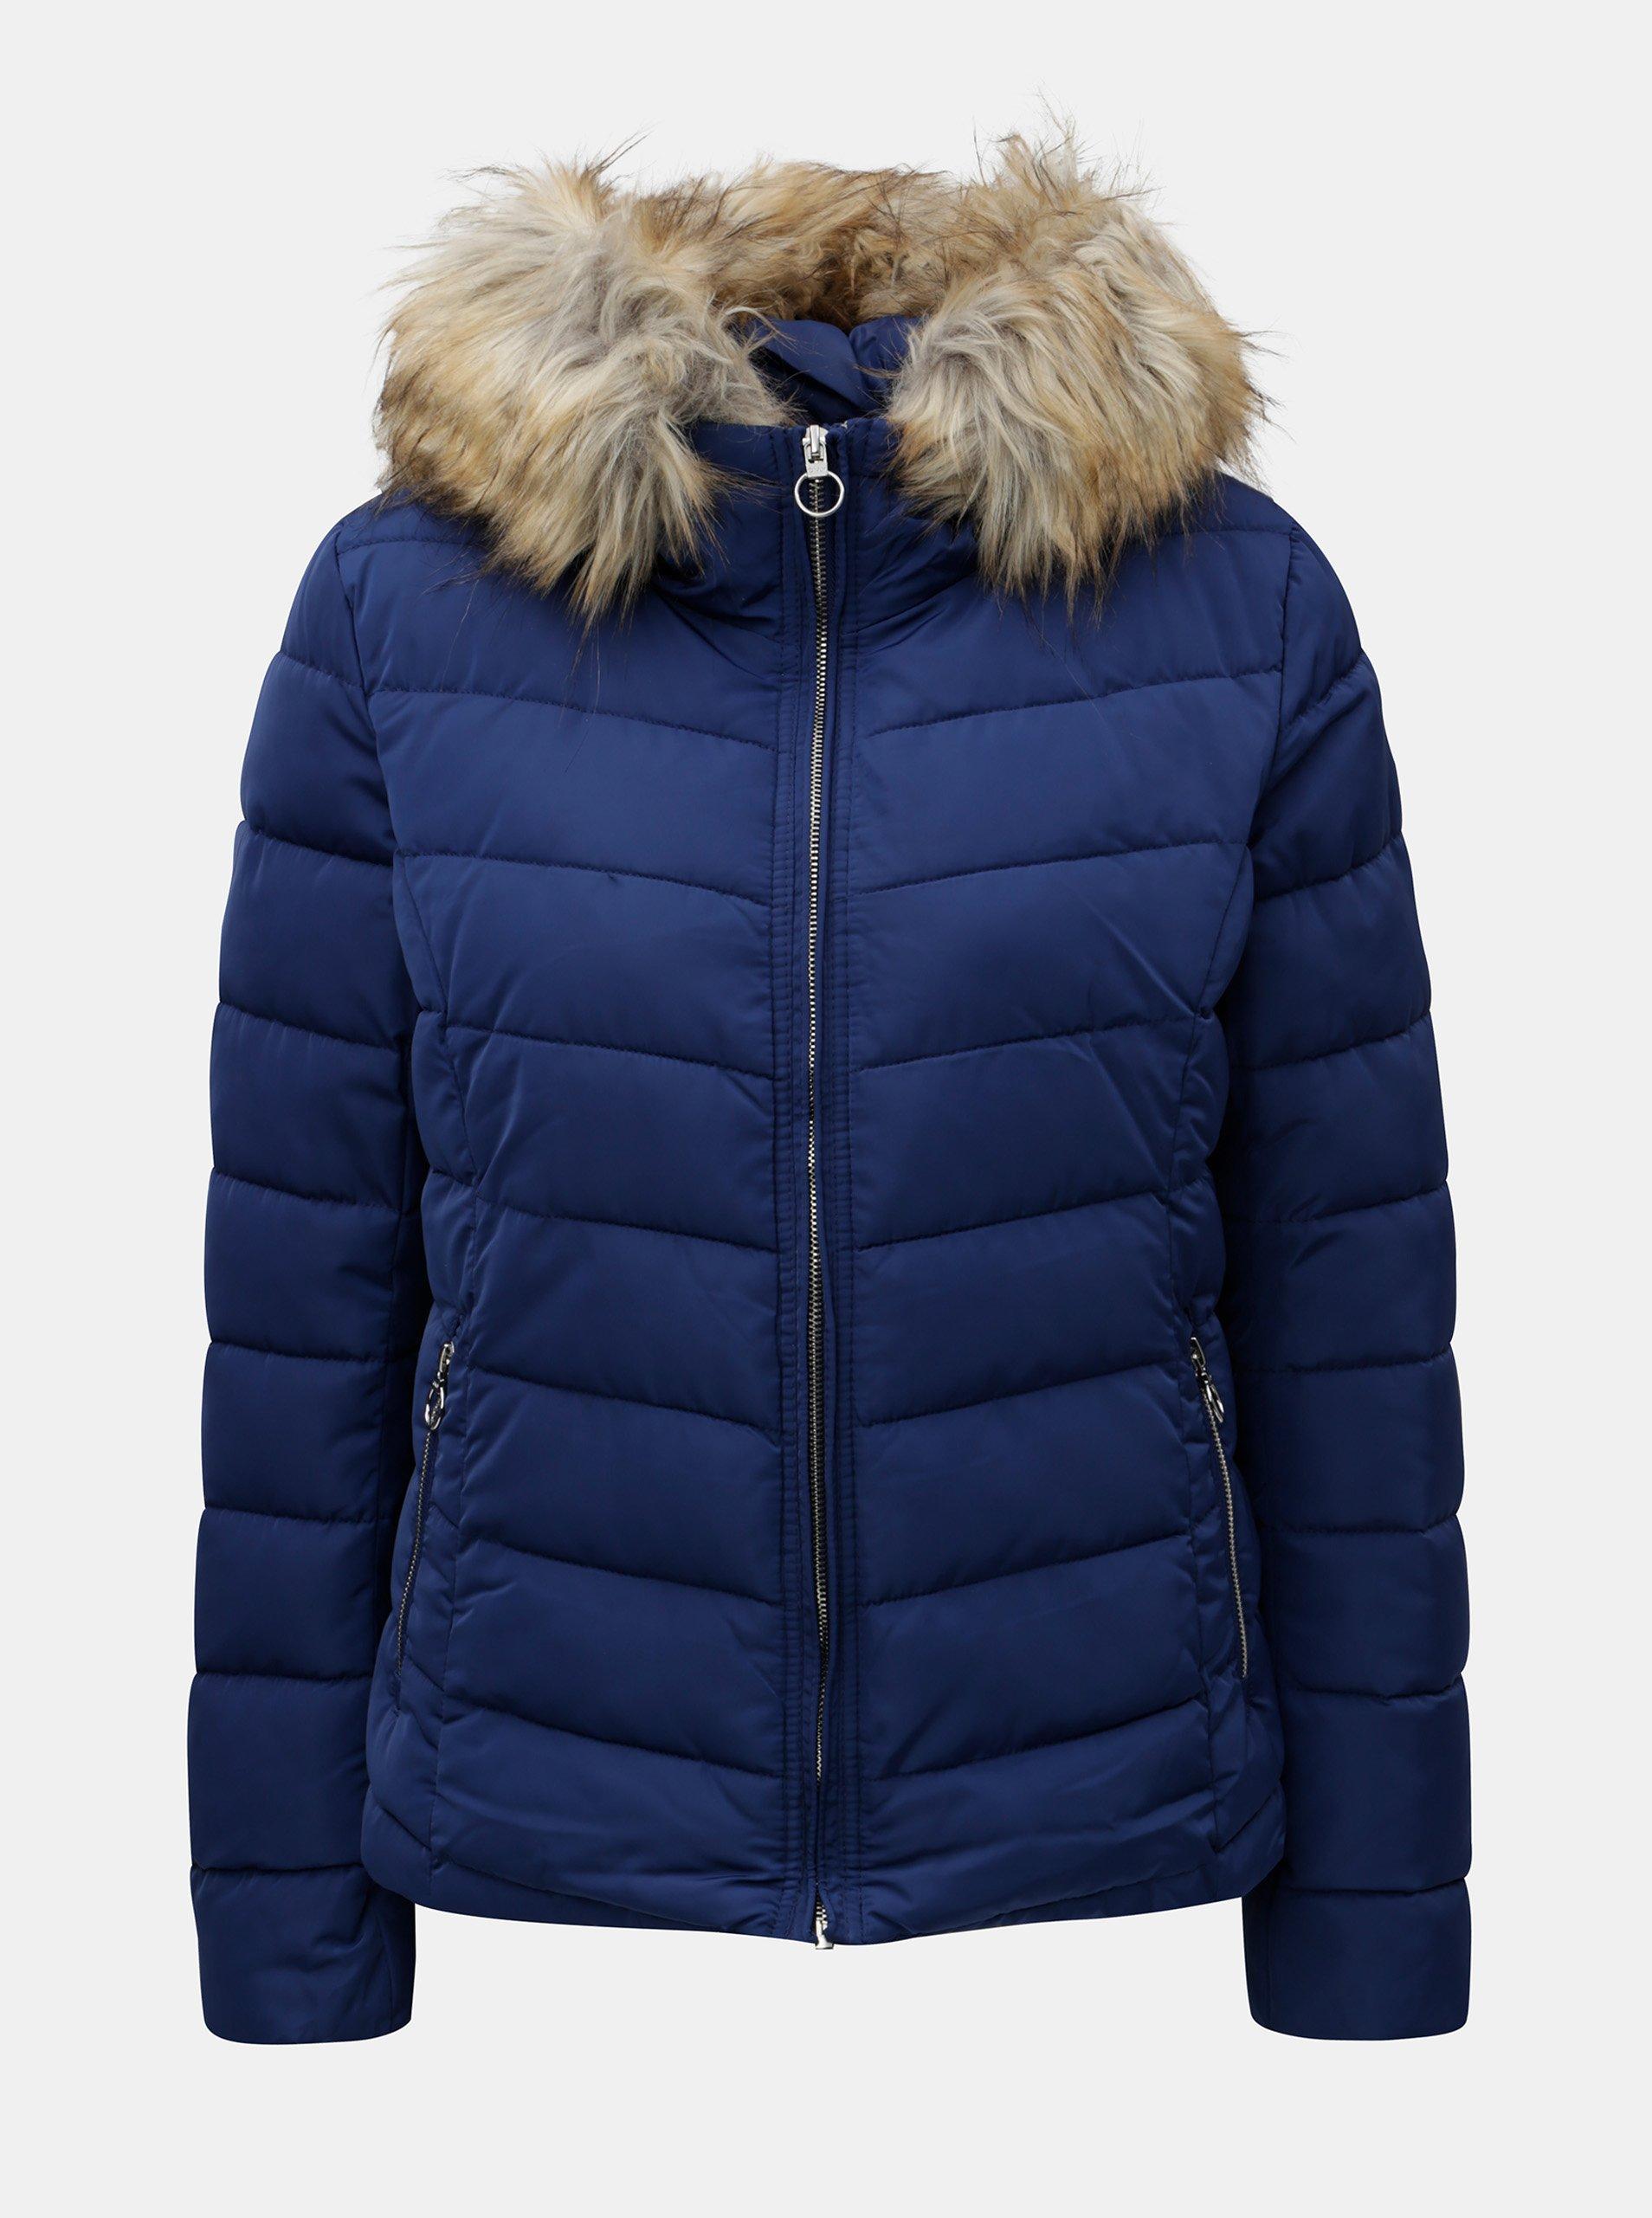 Modrá prešívaná zimná bunda s umelou kožušinkou ONLY Ellan